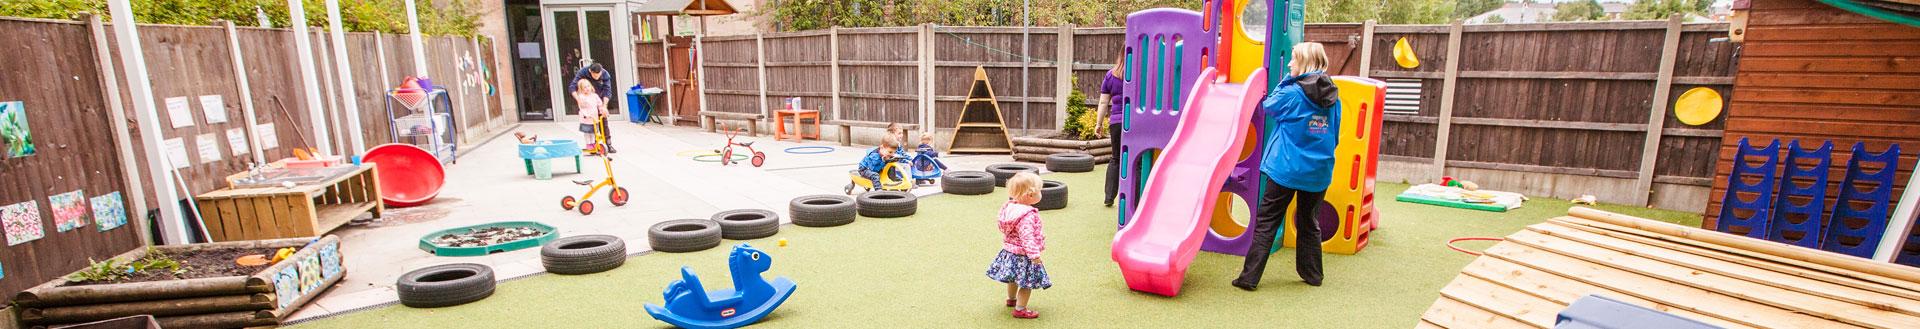 Sandbrook Park Day Nursery